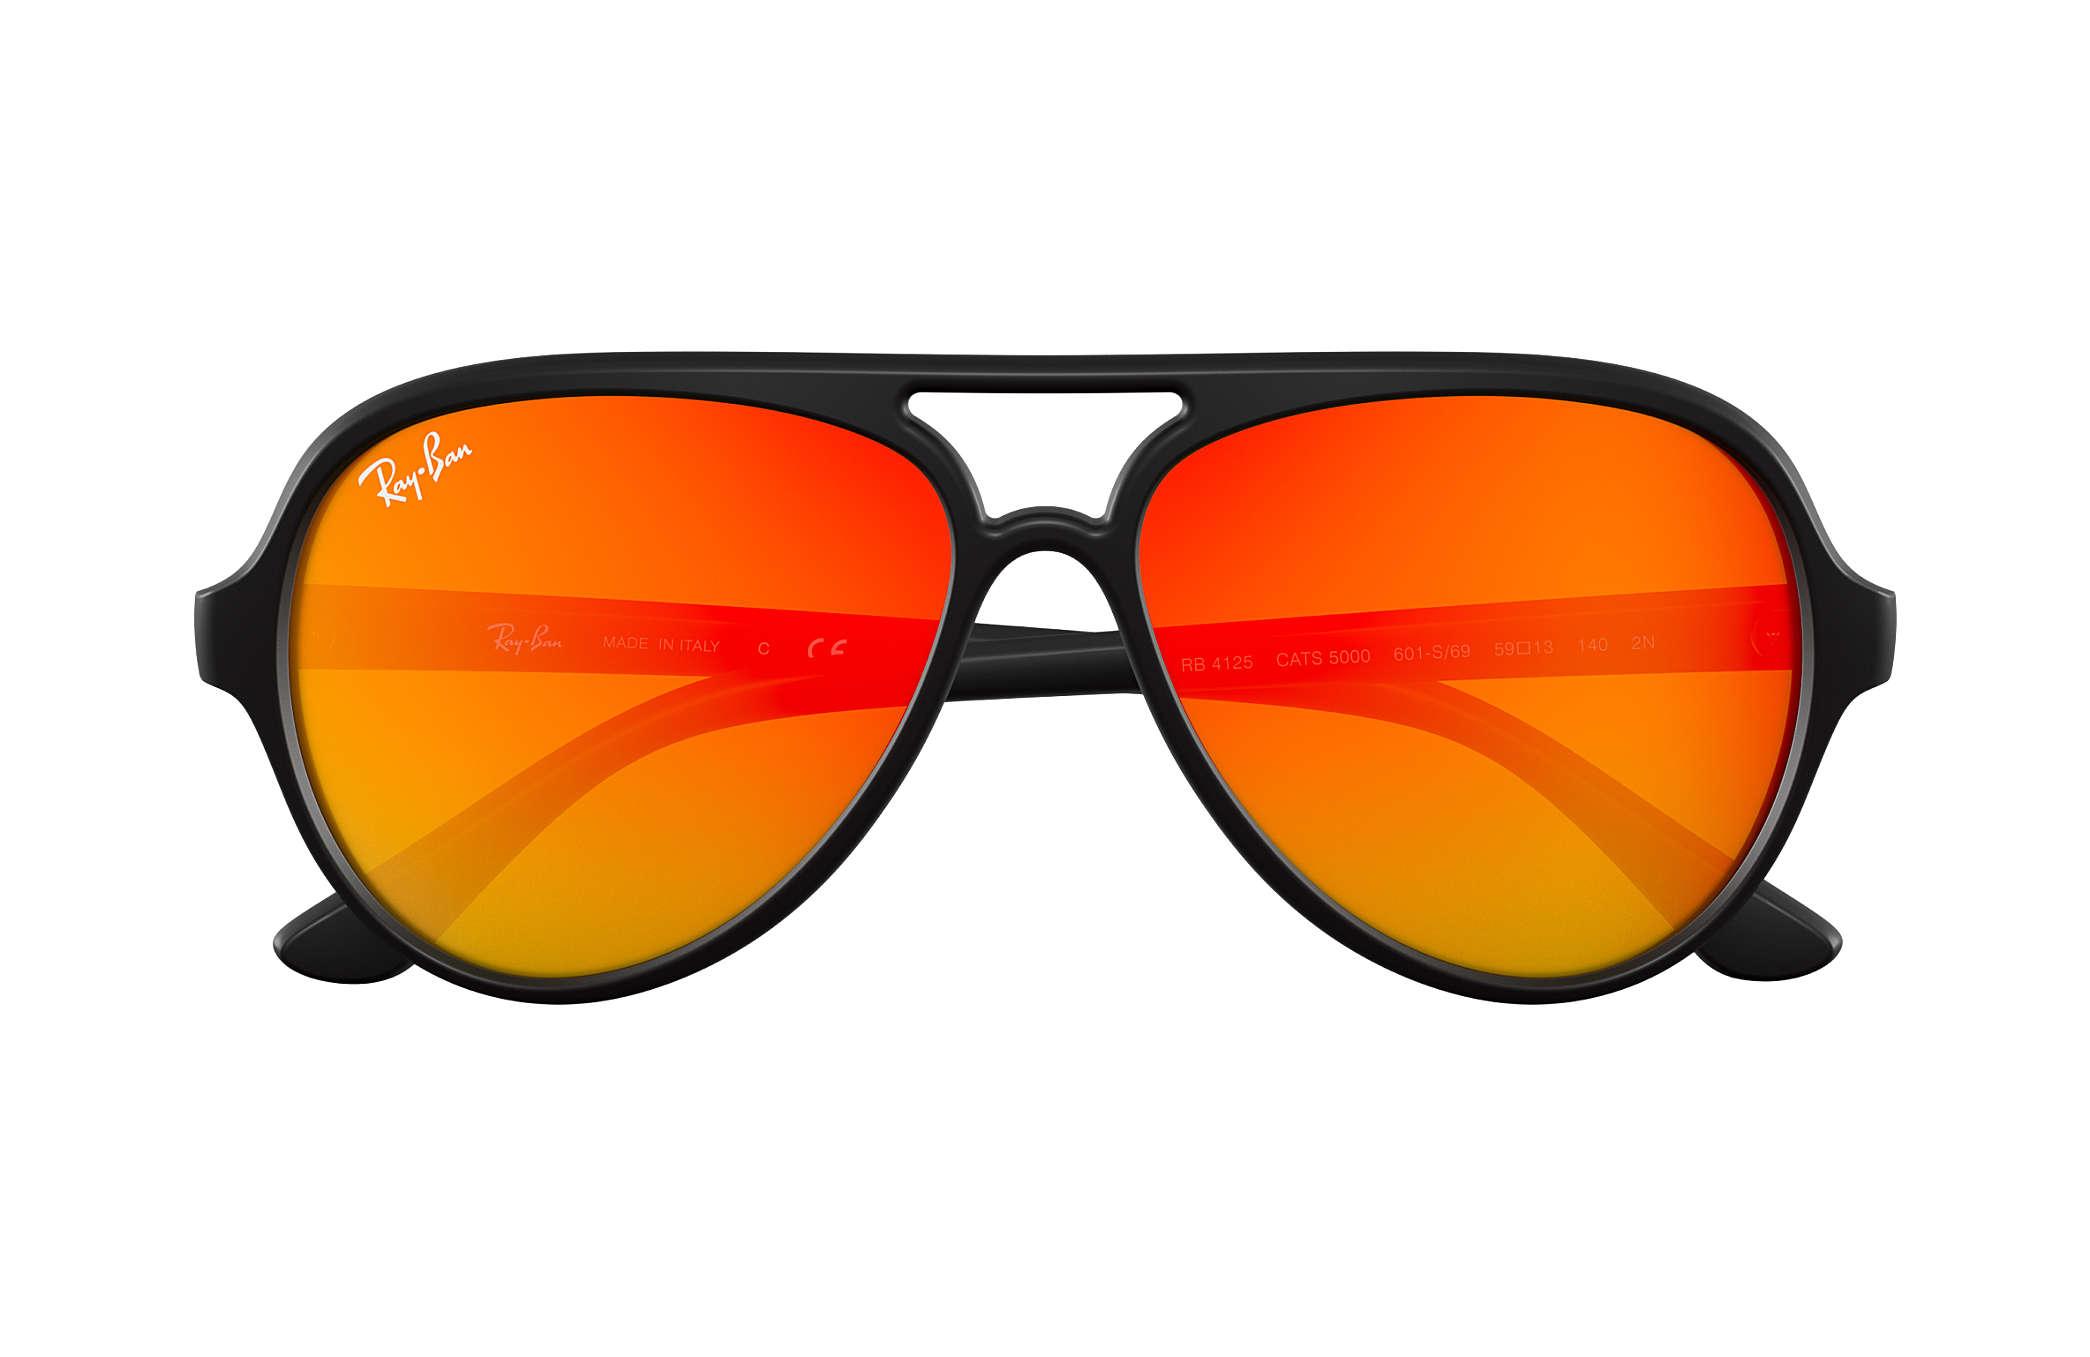 6ae5b249c65eb ... top quality ray ban 0rb4125 cats 5000 flash lenses black sun c9816  2a5fe ...